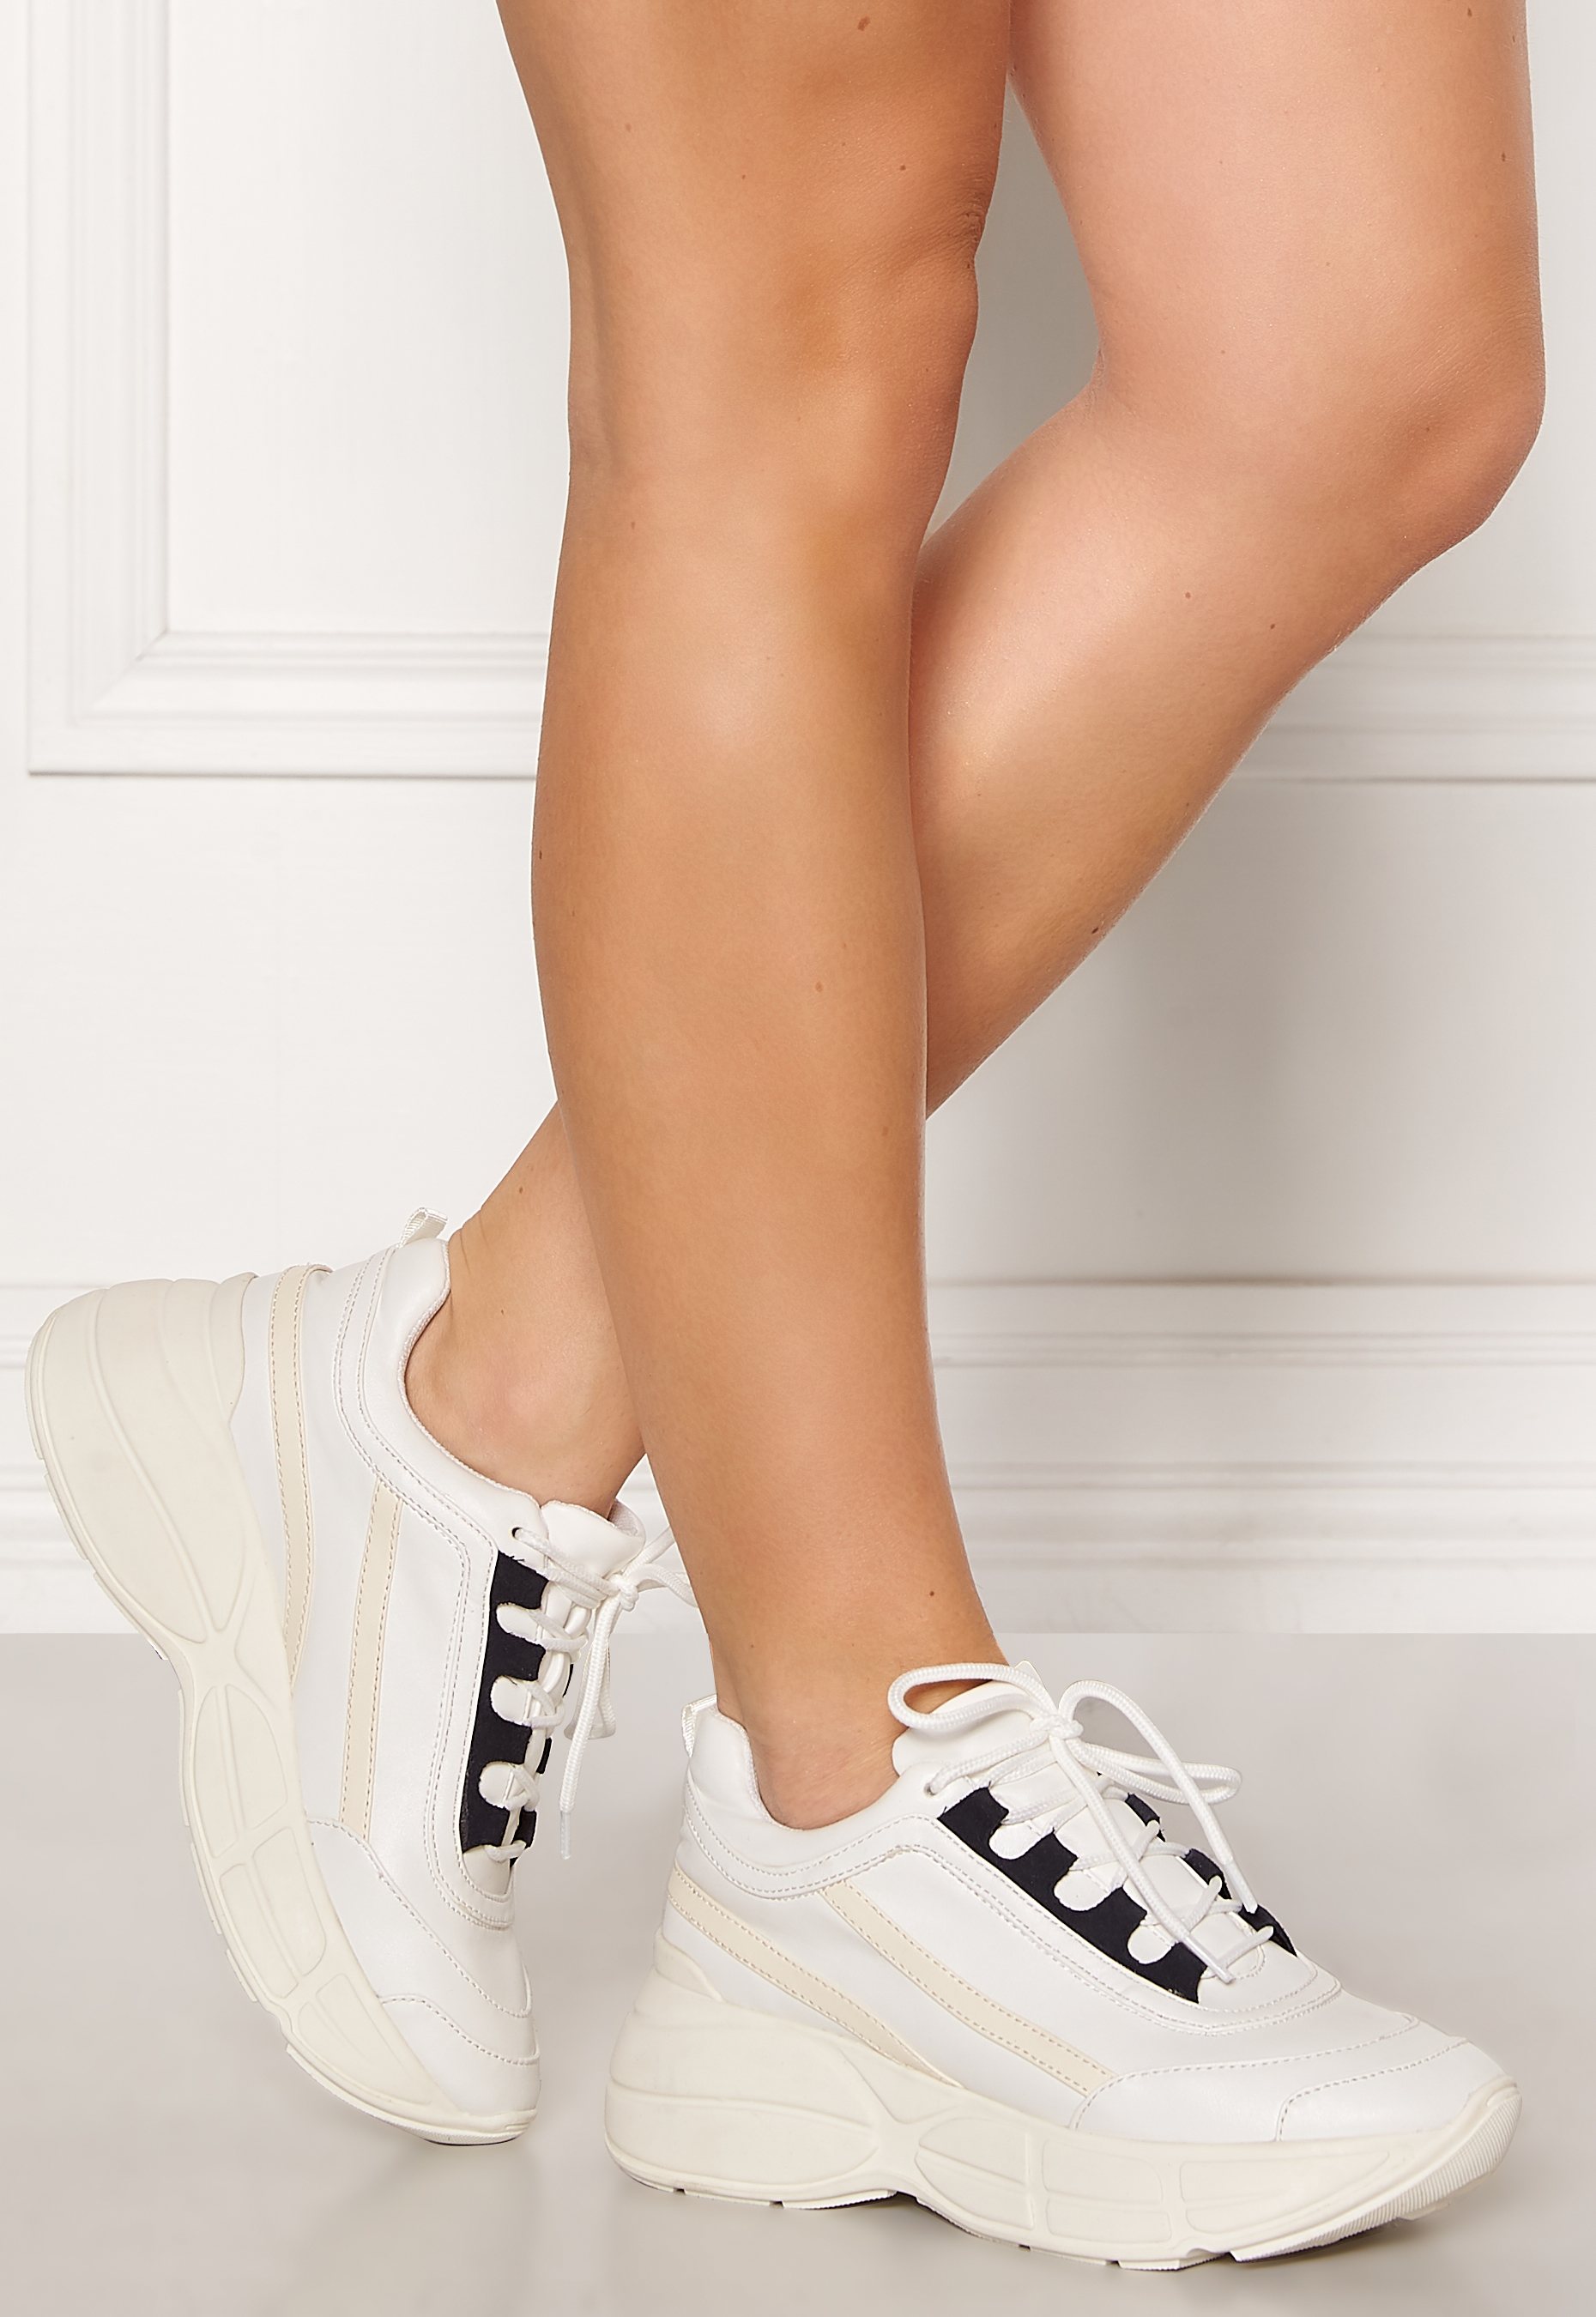 da3db462 Steve Madden Mature Sneaker 2 White - Bubbleroom